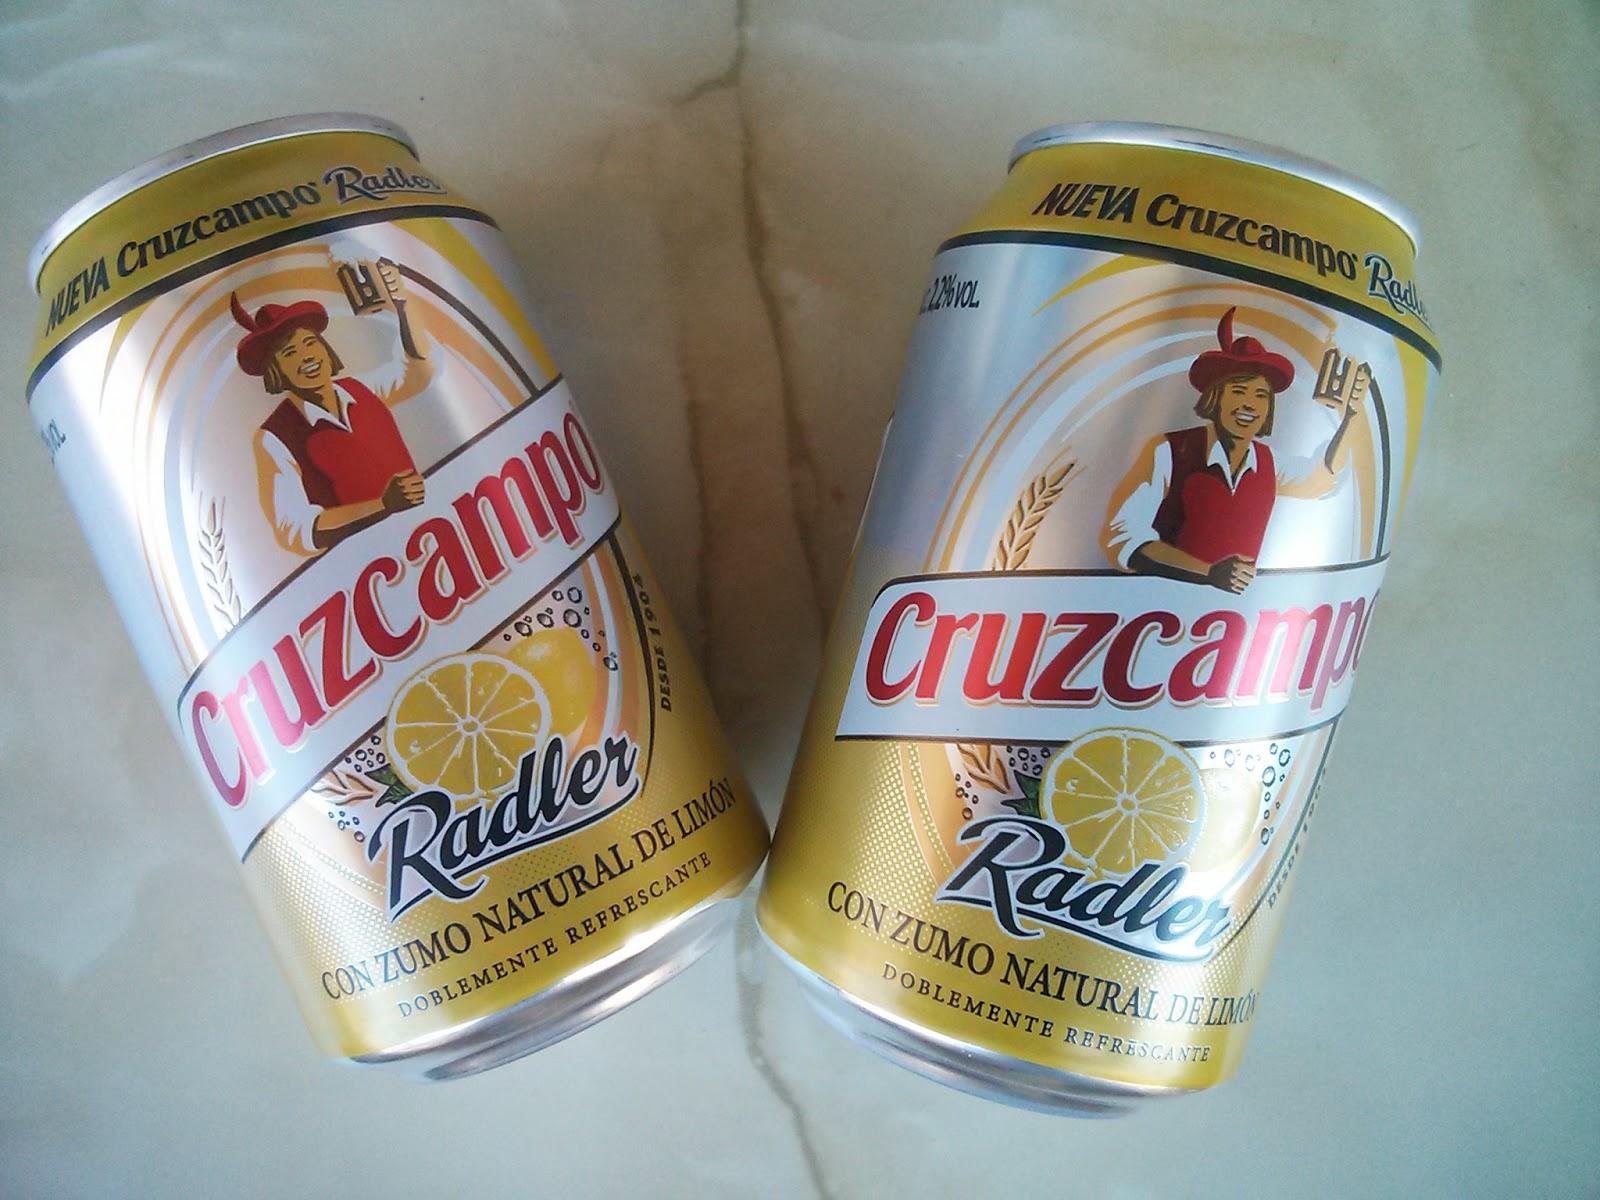 Cruzcampo Radler